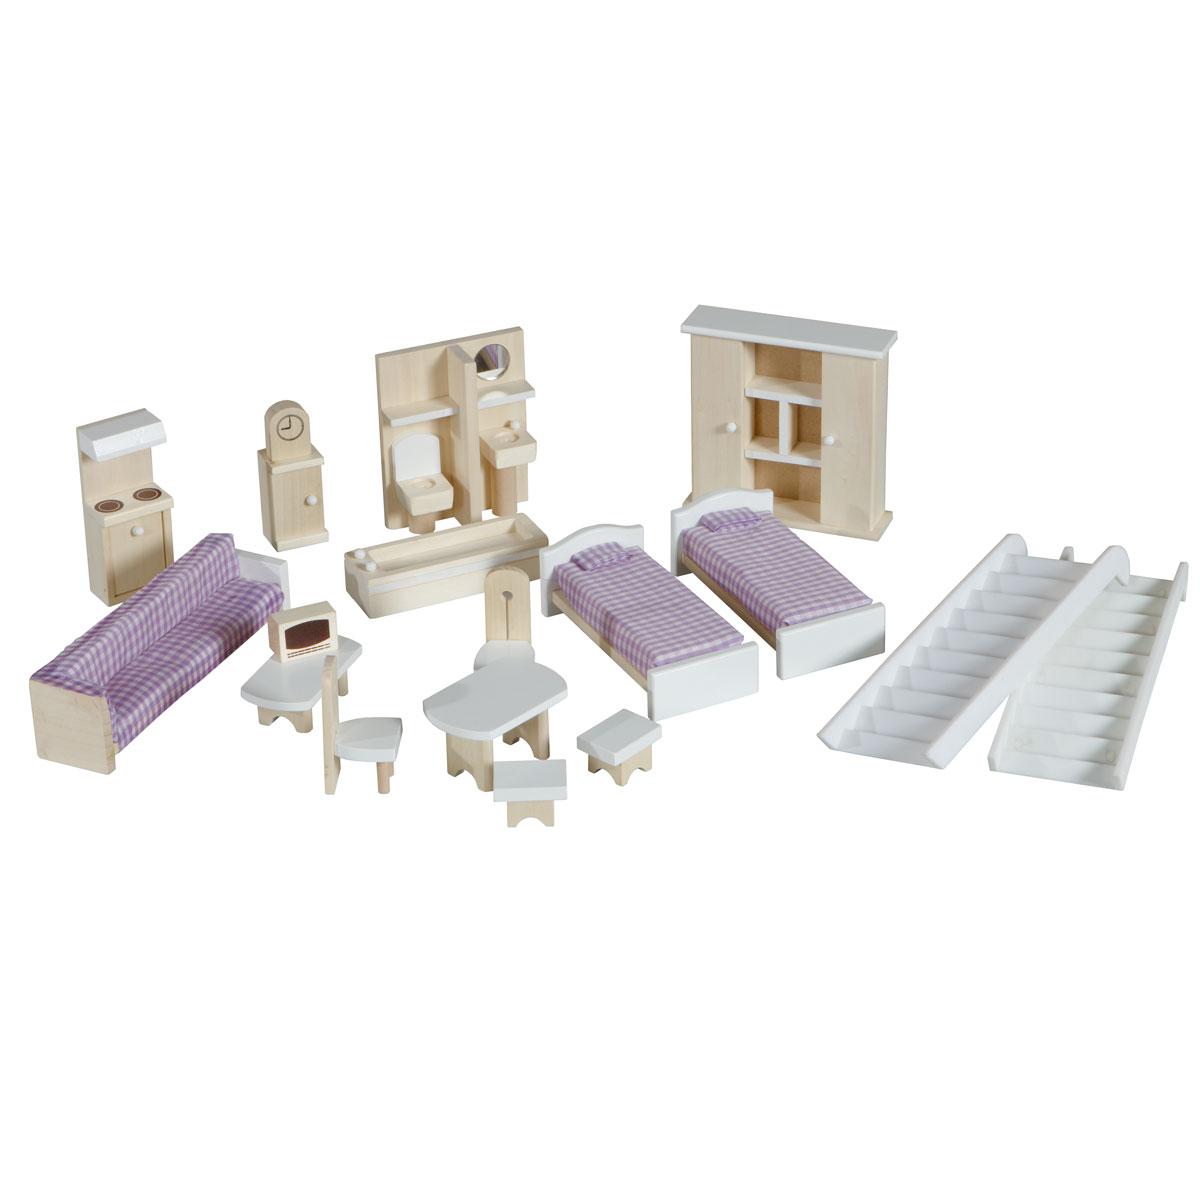 Roba 9462 puppenhaus aus holz inklusive puppenhausmöbel